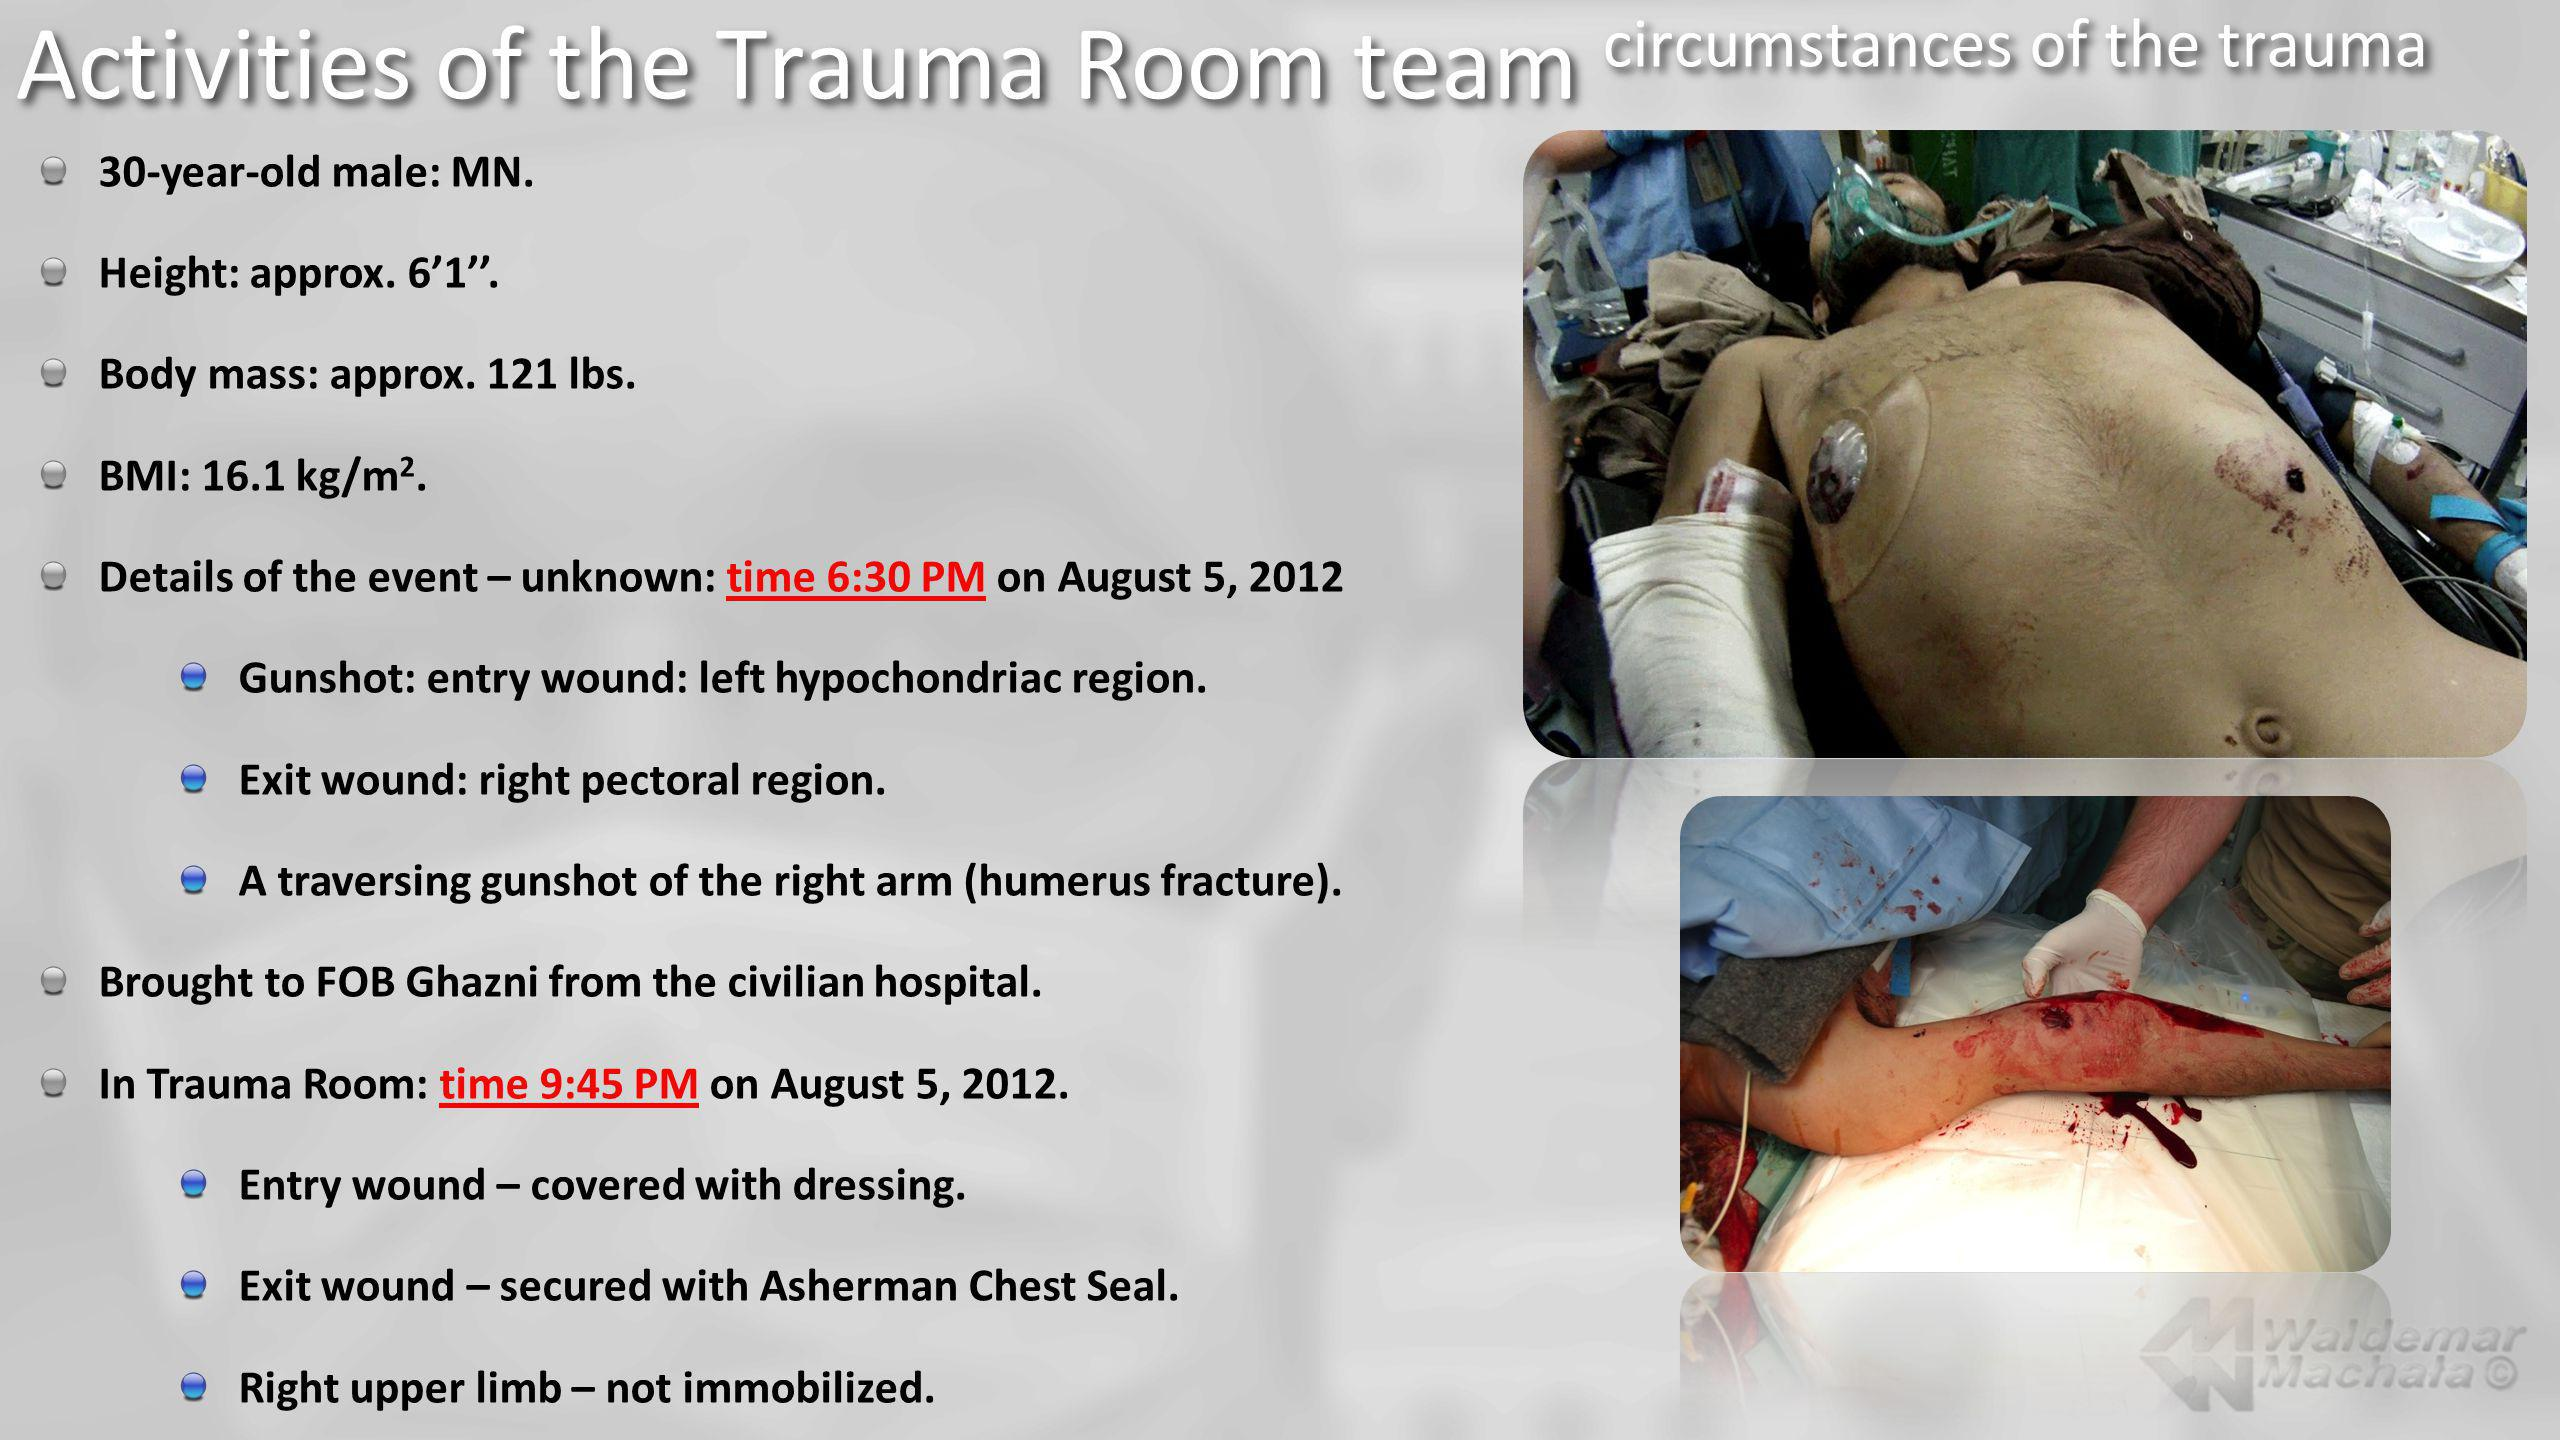 Activities of the Trauma Room team circumstances of the trauma